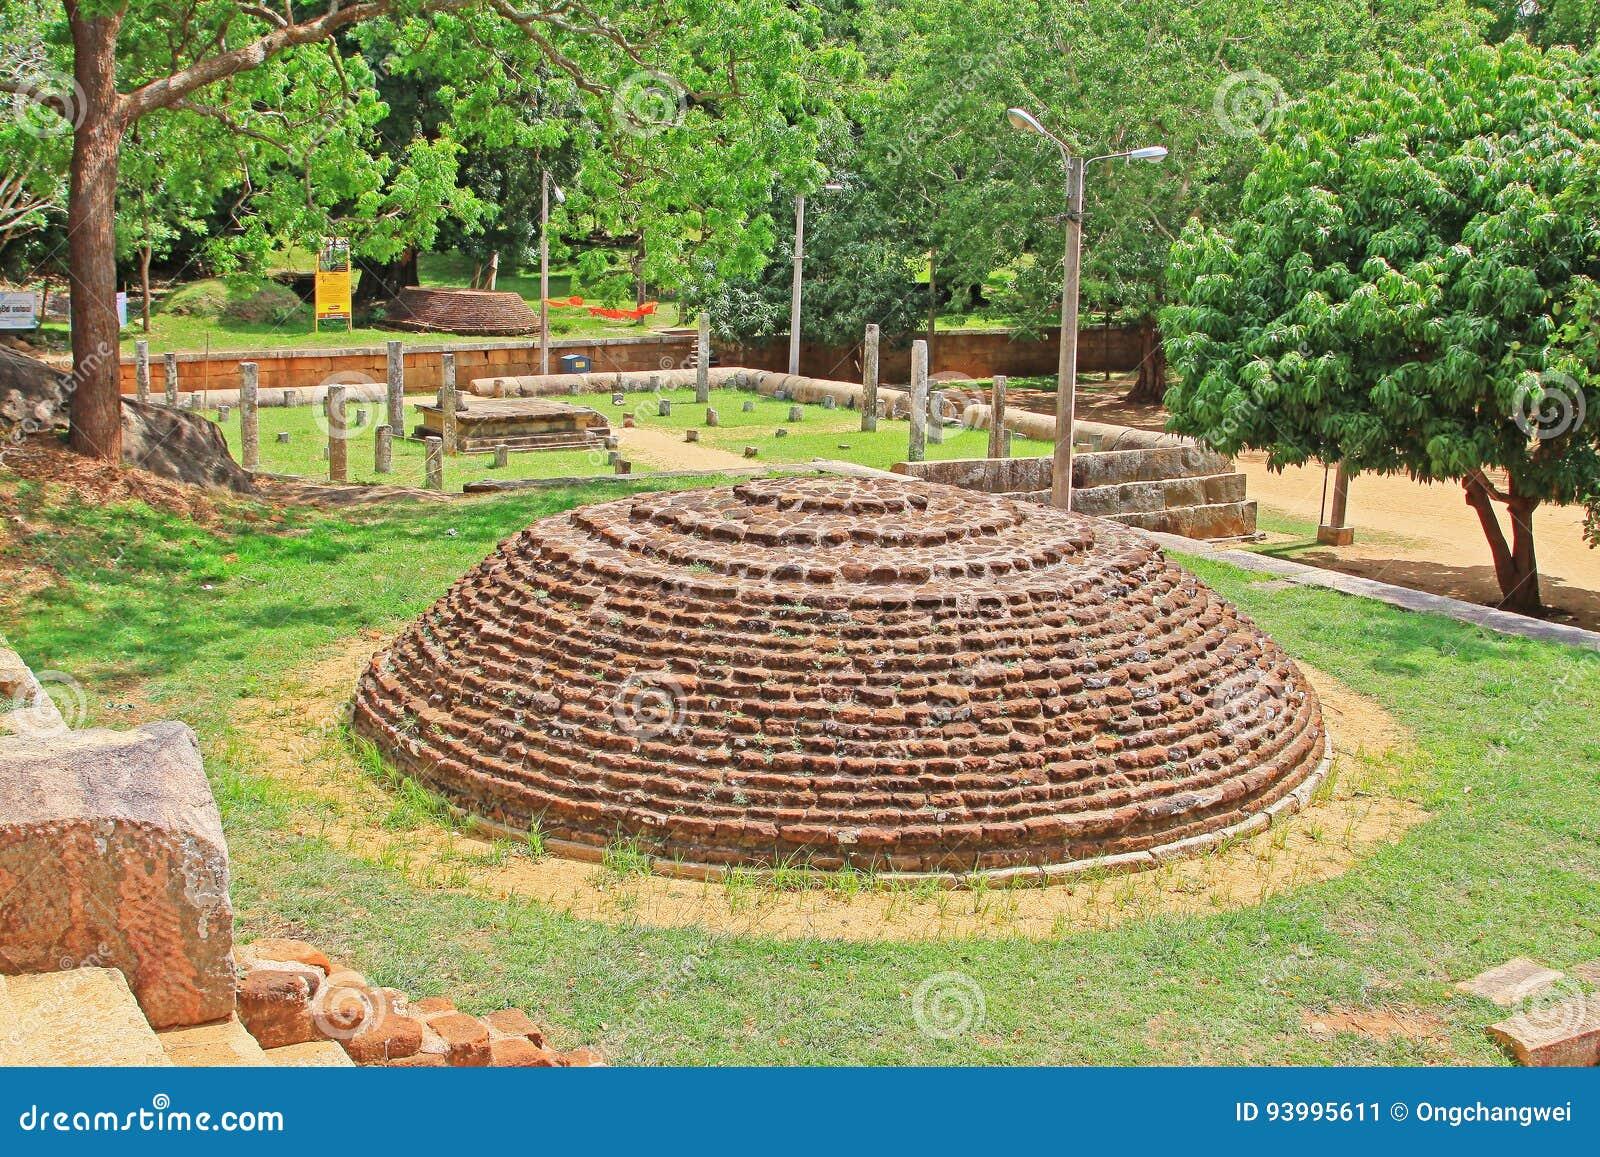 Anuradhapura Mihintale Conference Hall, Sri Lanka UNESCO World Heritage